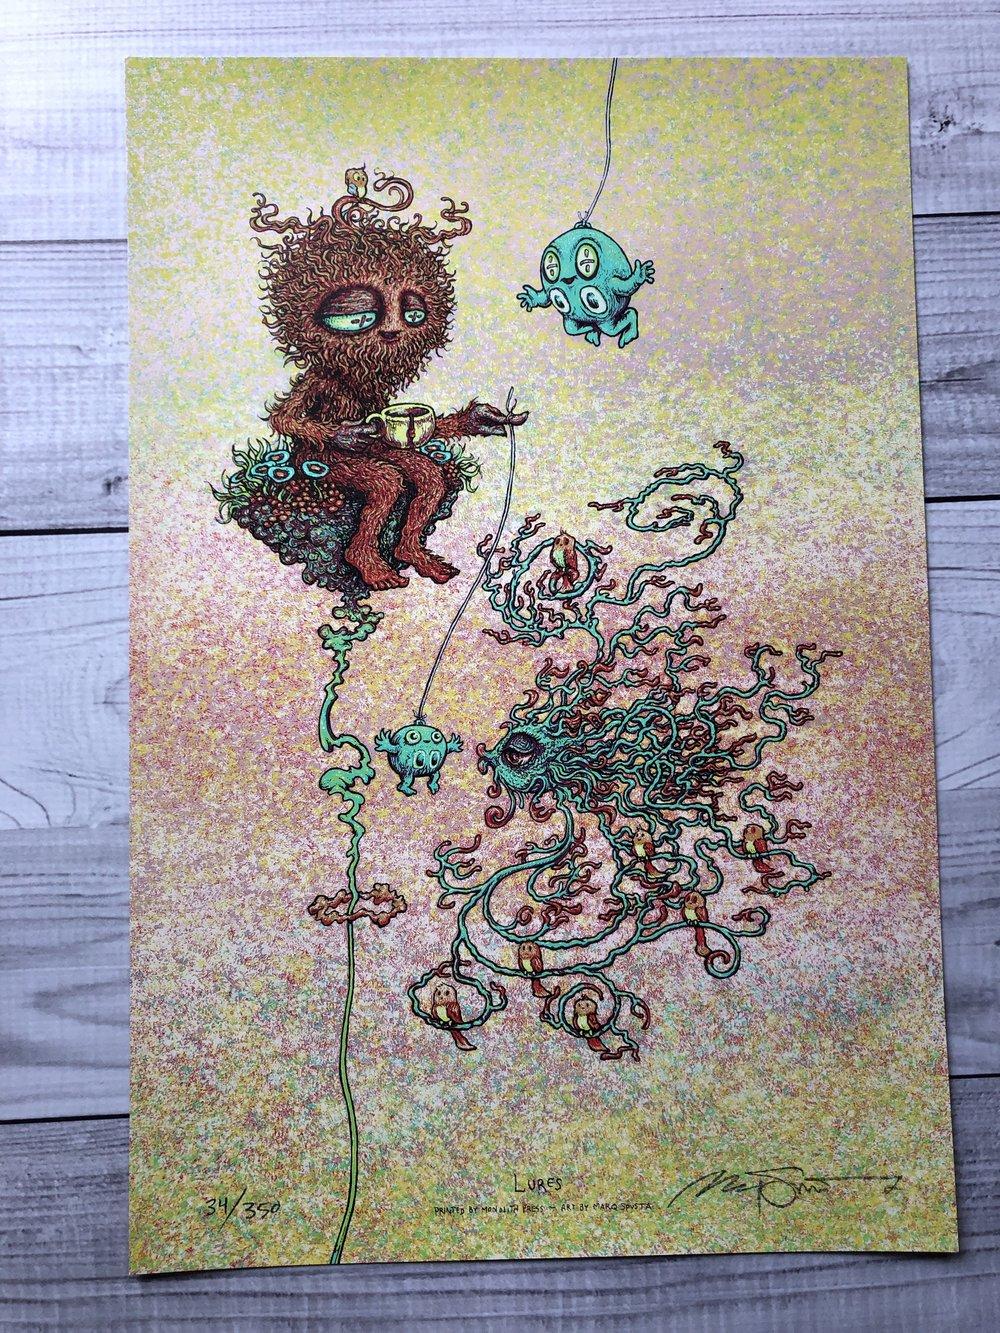 $170 Main Ed Lures + 2 Mystery Mini Prints